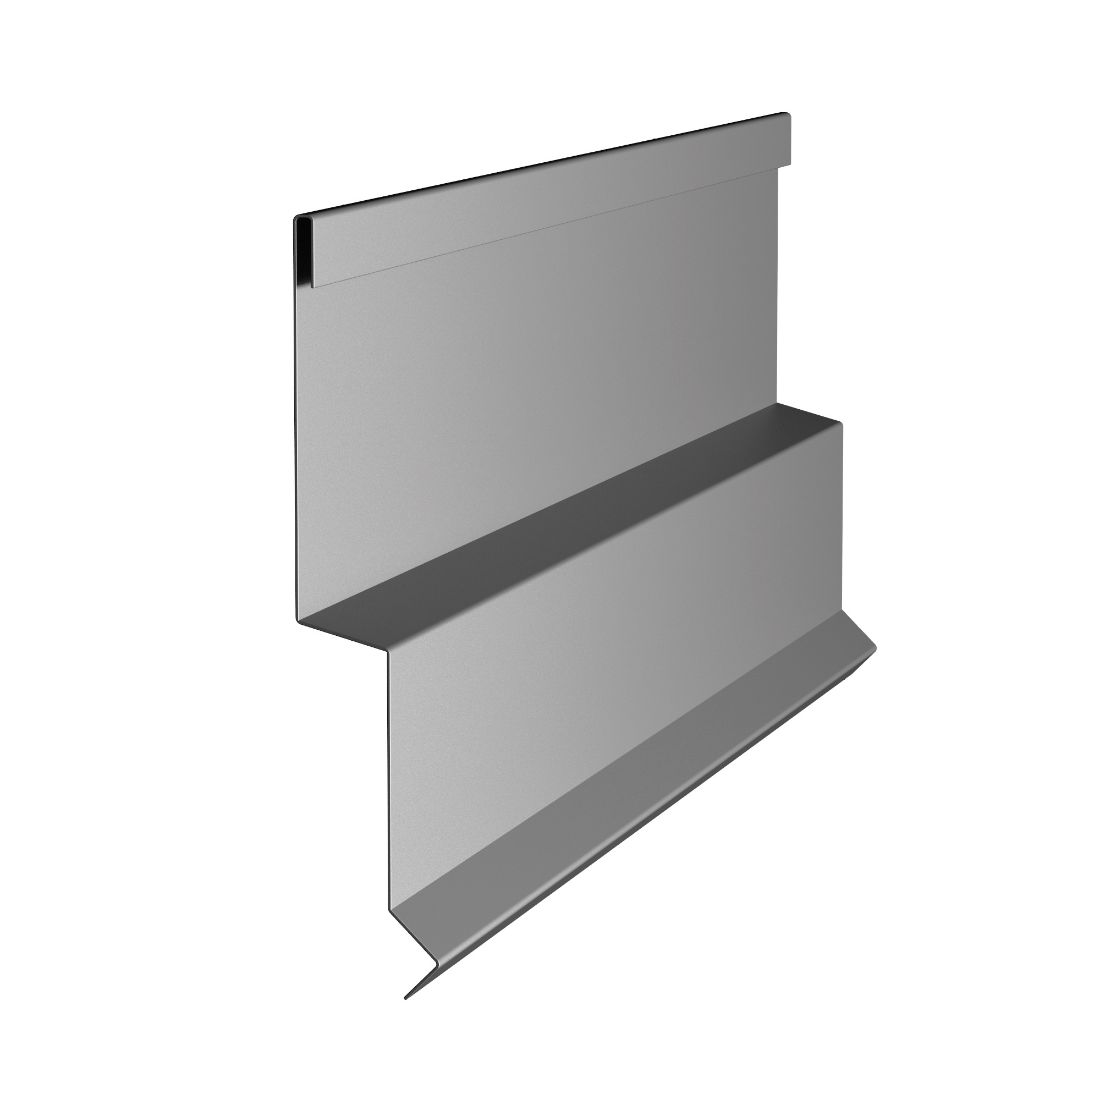 Shadowclad Horizontal Z Stainless Steel Flashing 3.0m